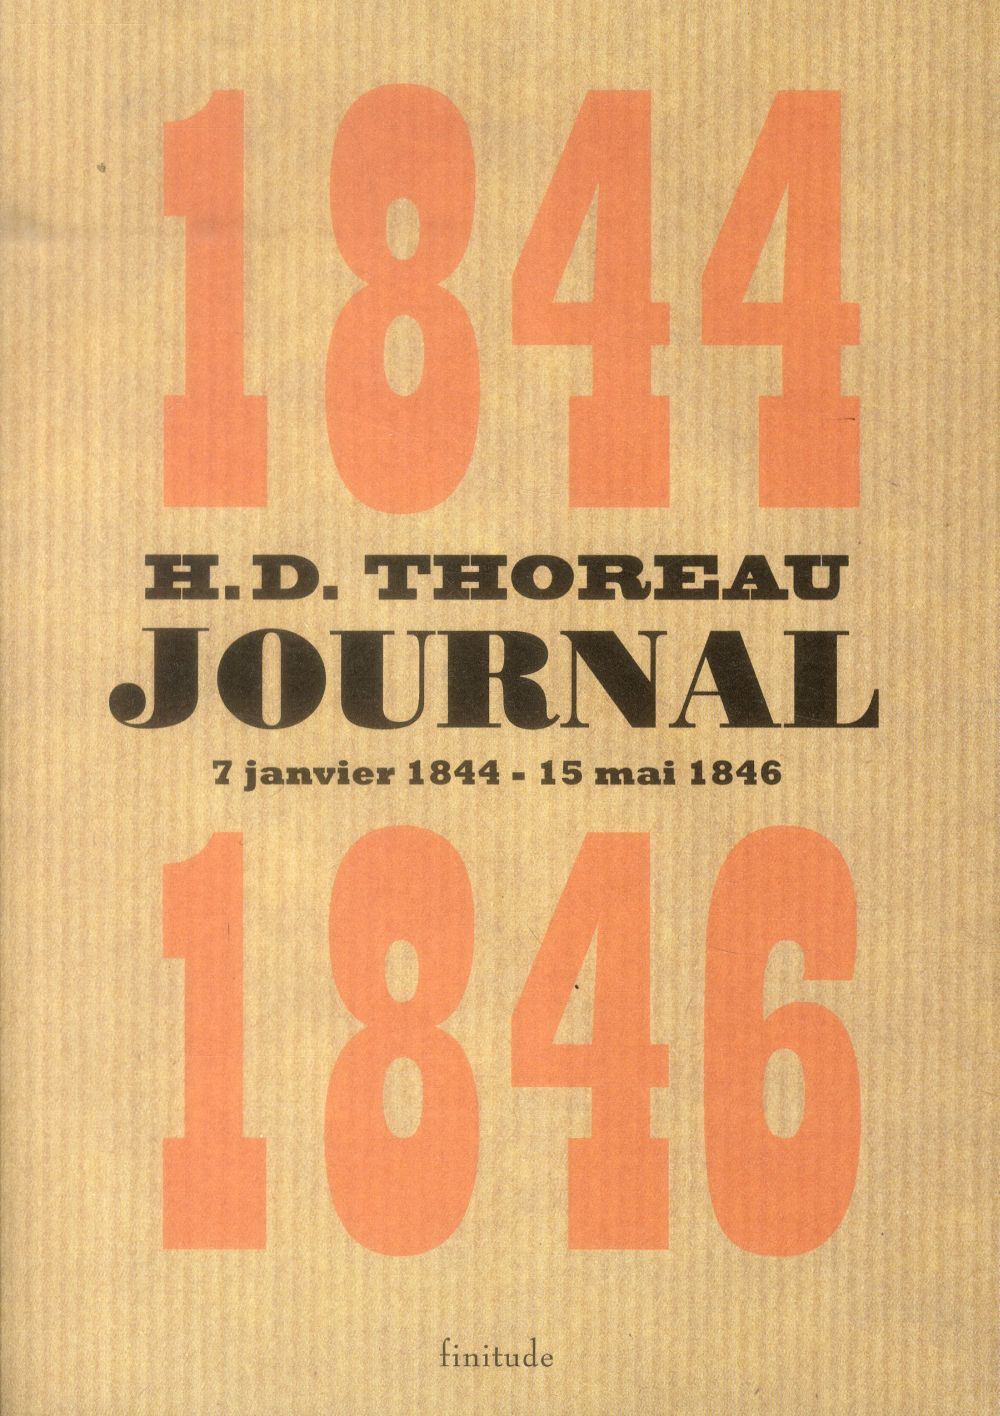 Journal 7 janvier 1844-15 mai 1846 Vol.3